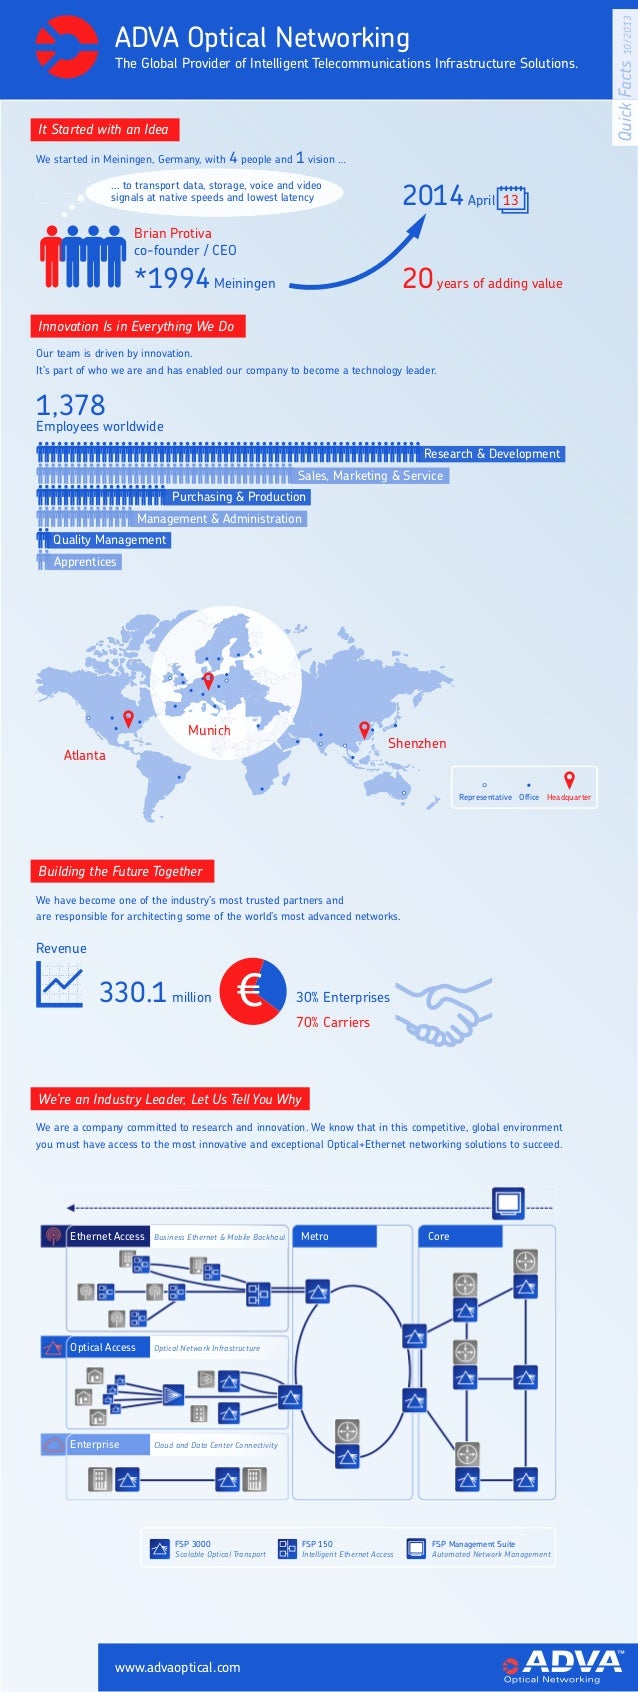 ADVA Optical Networking - Quick Facts